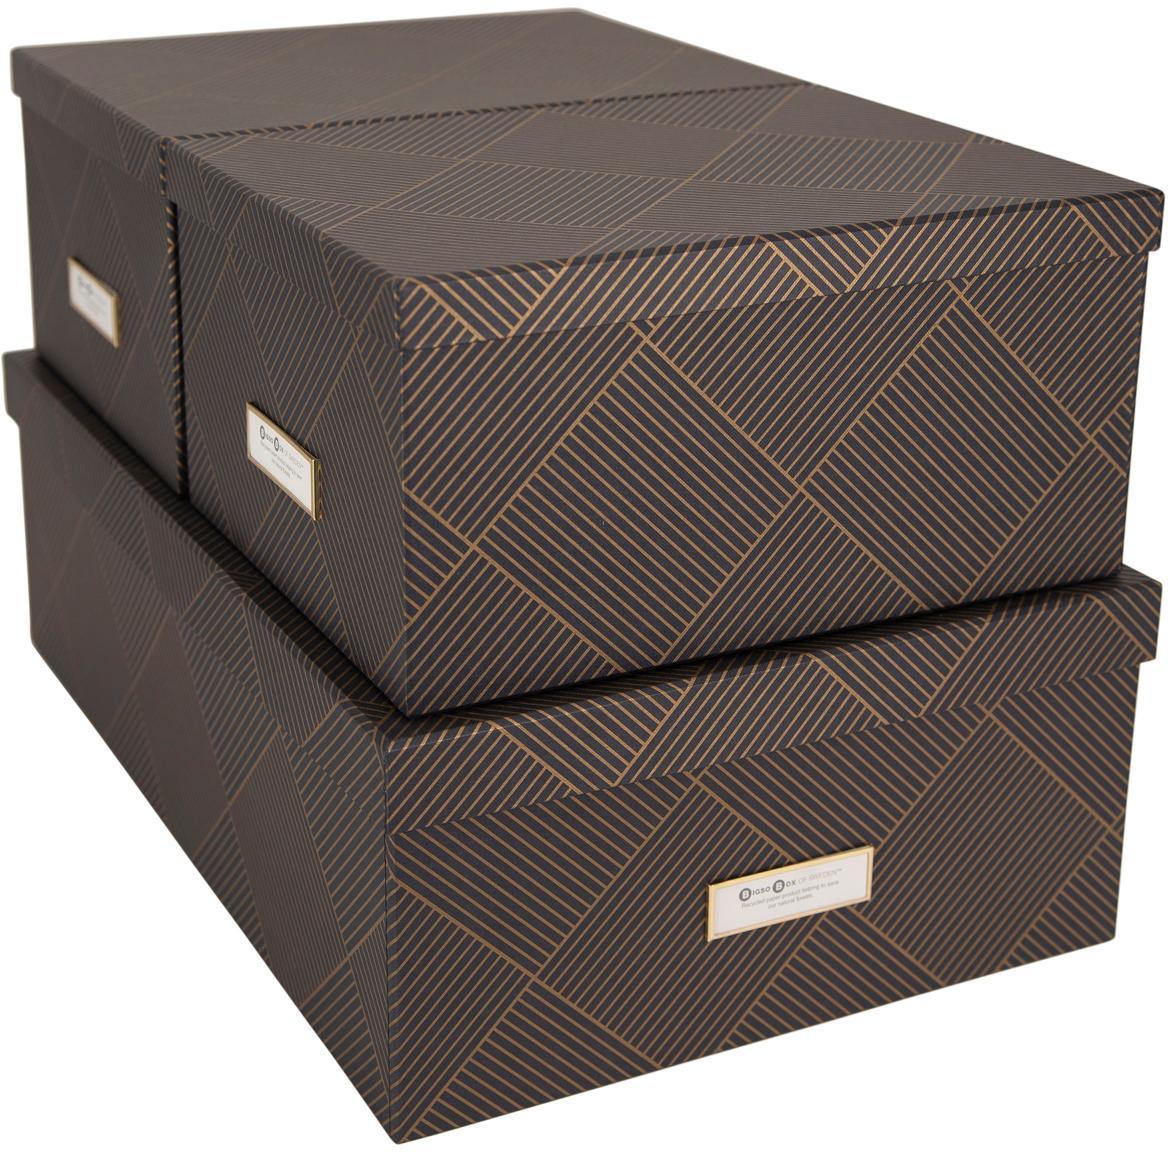 Set de cajas Inge, 3pzas., Caja: cartón laminado, Dorado, gris oscuro, Set de diferentes tamaños